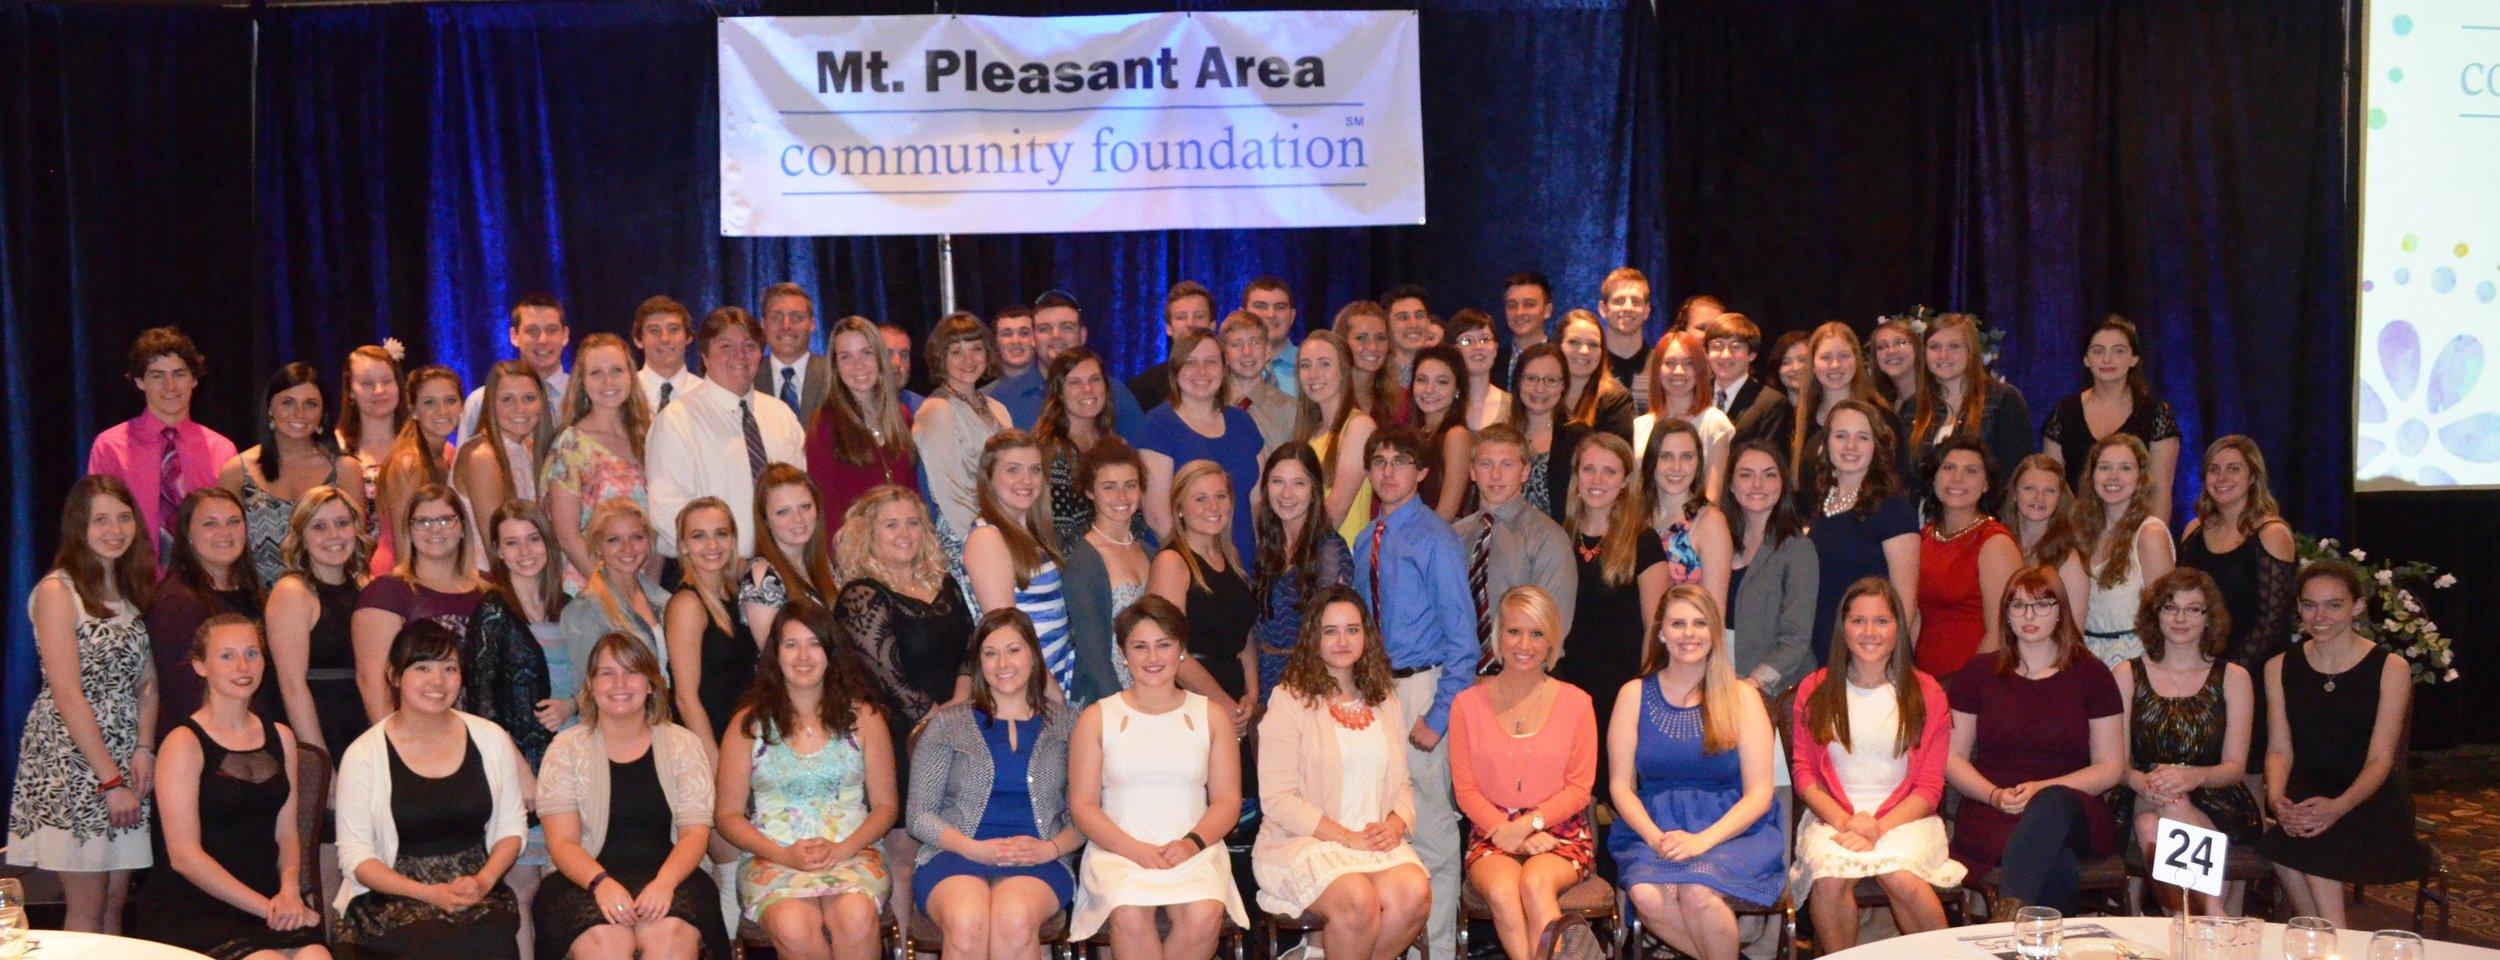 2016 MPACF Scholarship Reception